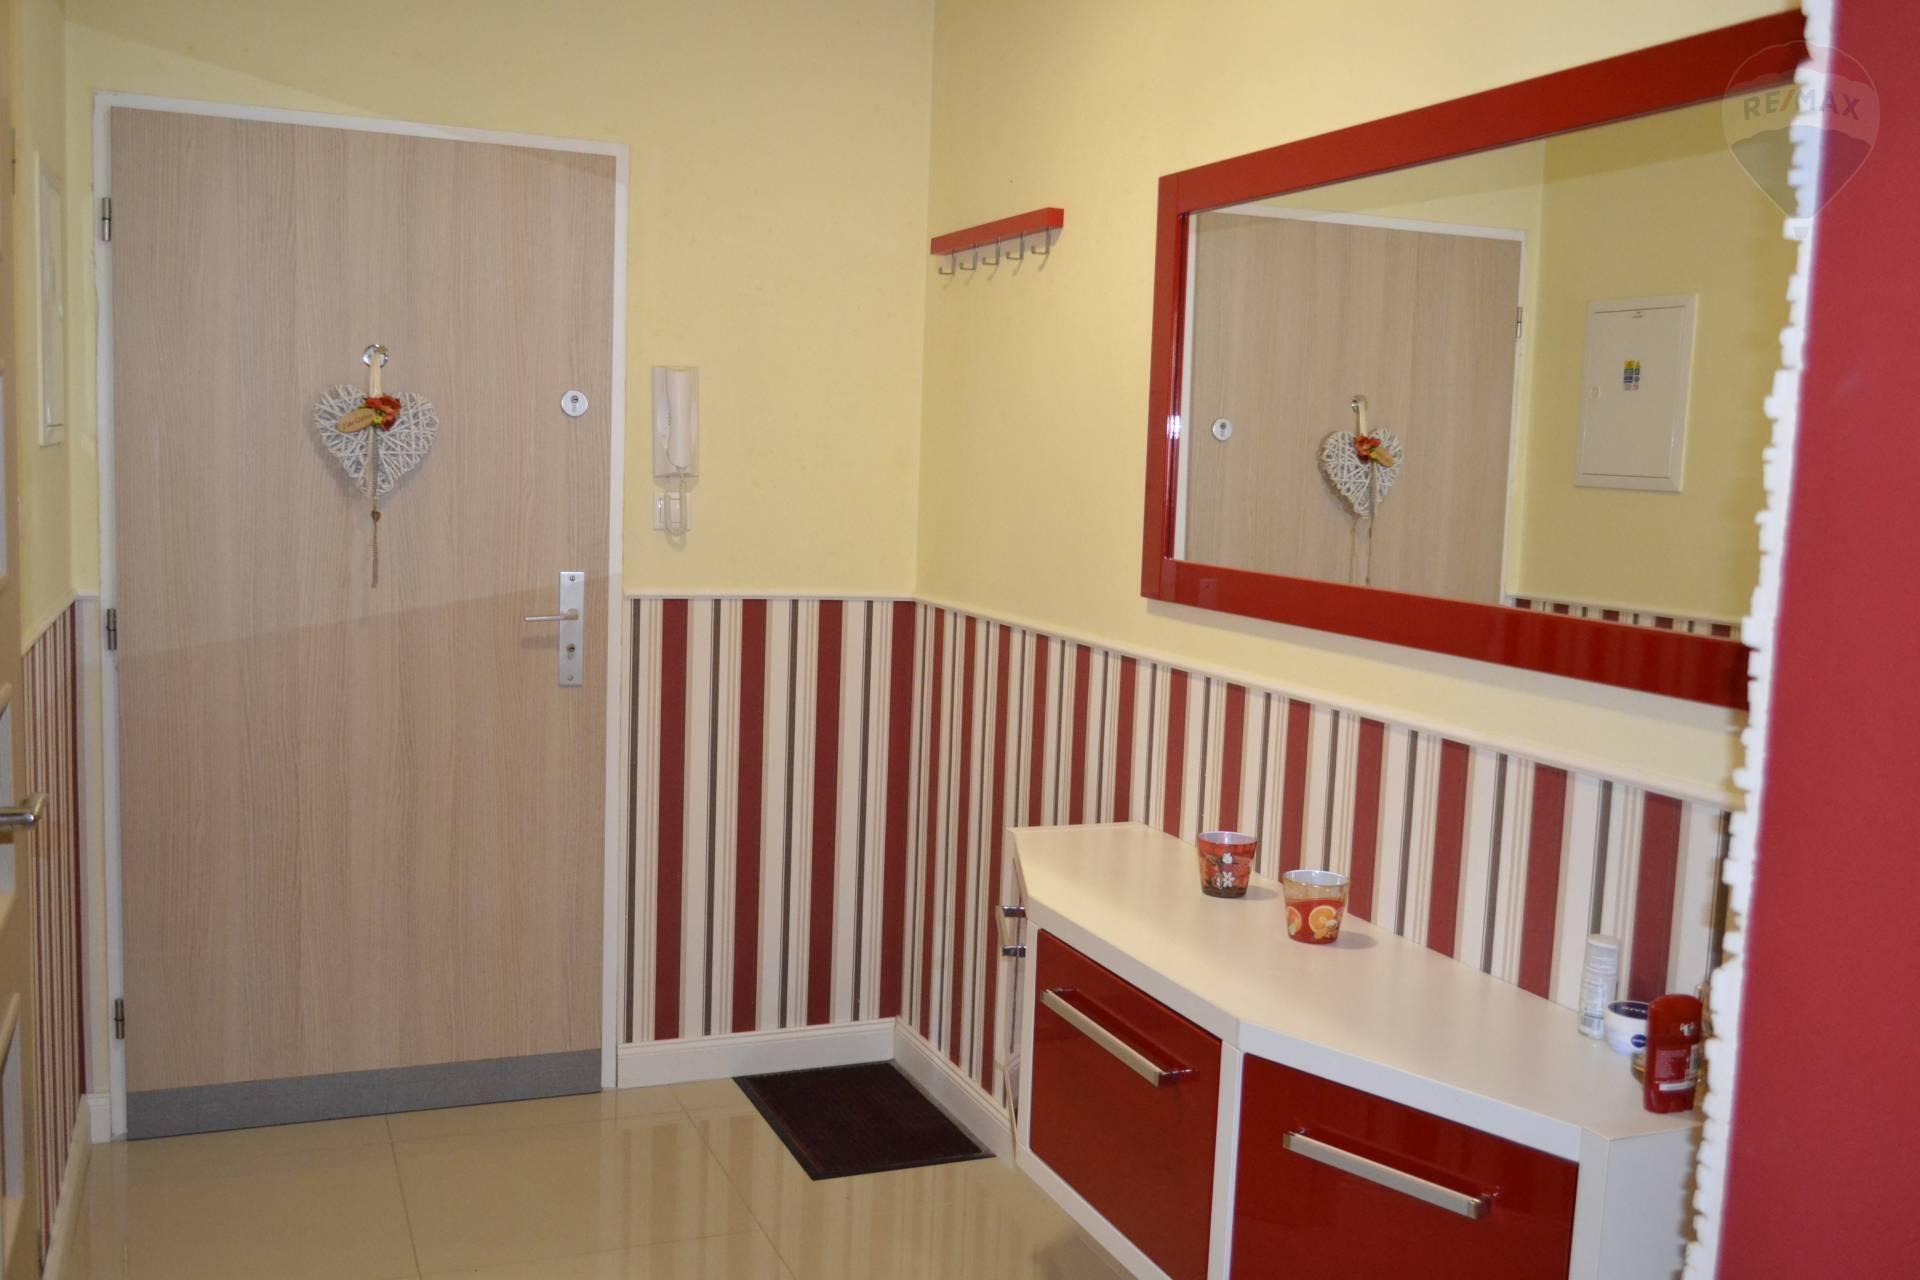 1 izbový byt 51 m2 v novostavbe, Veľký Meder